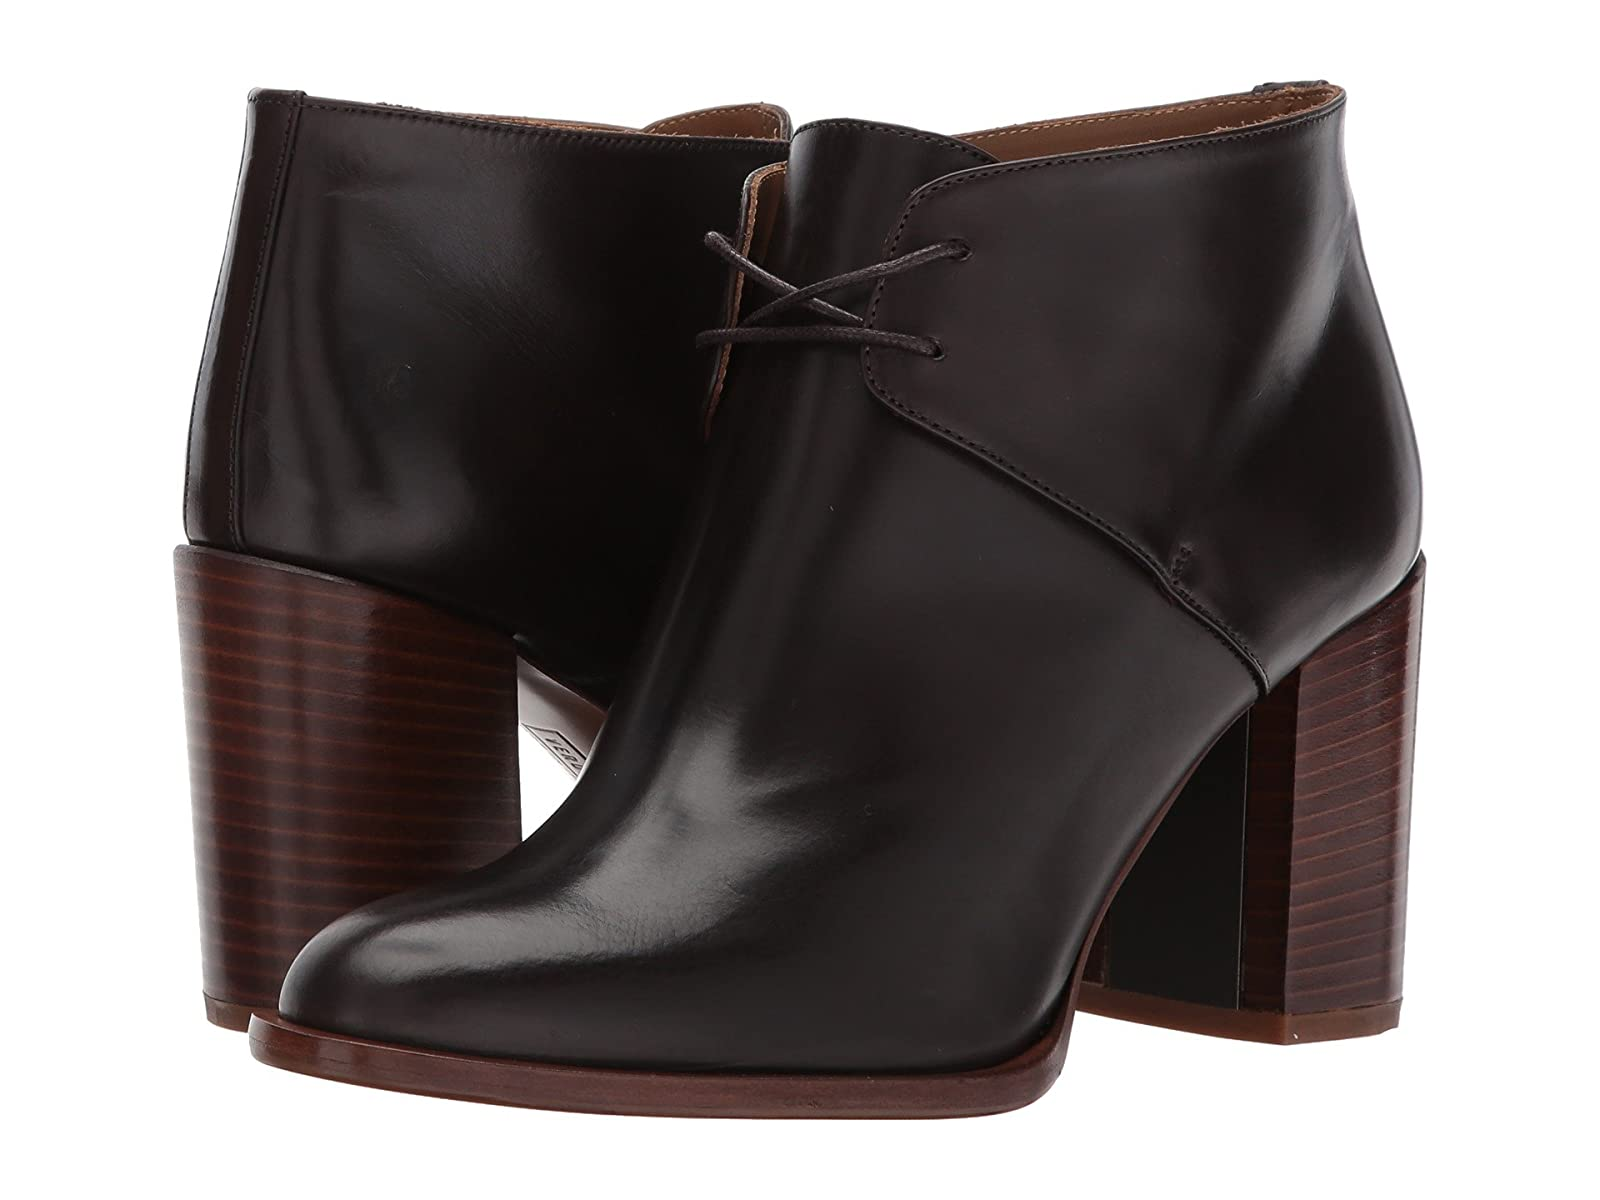 Veronique Branquihno VB29033 06002Cheap and distinctive eye-catching shoes